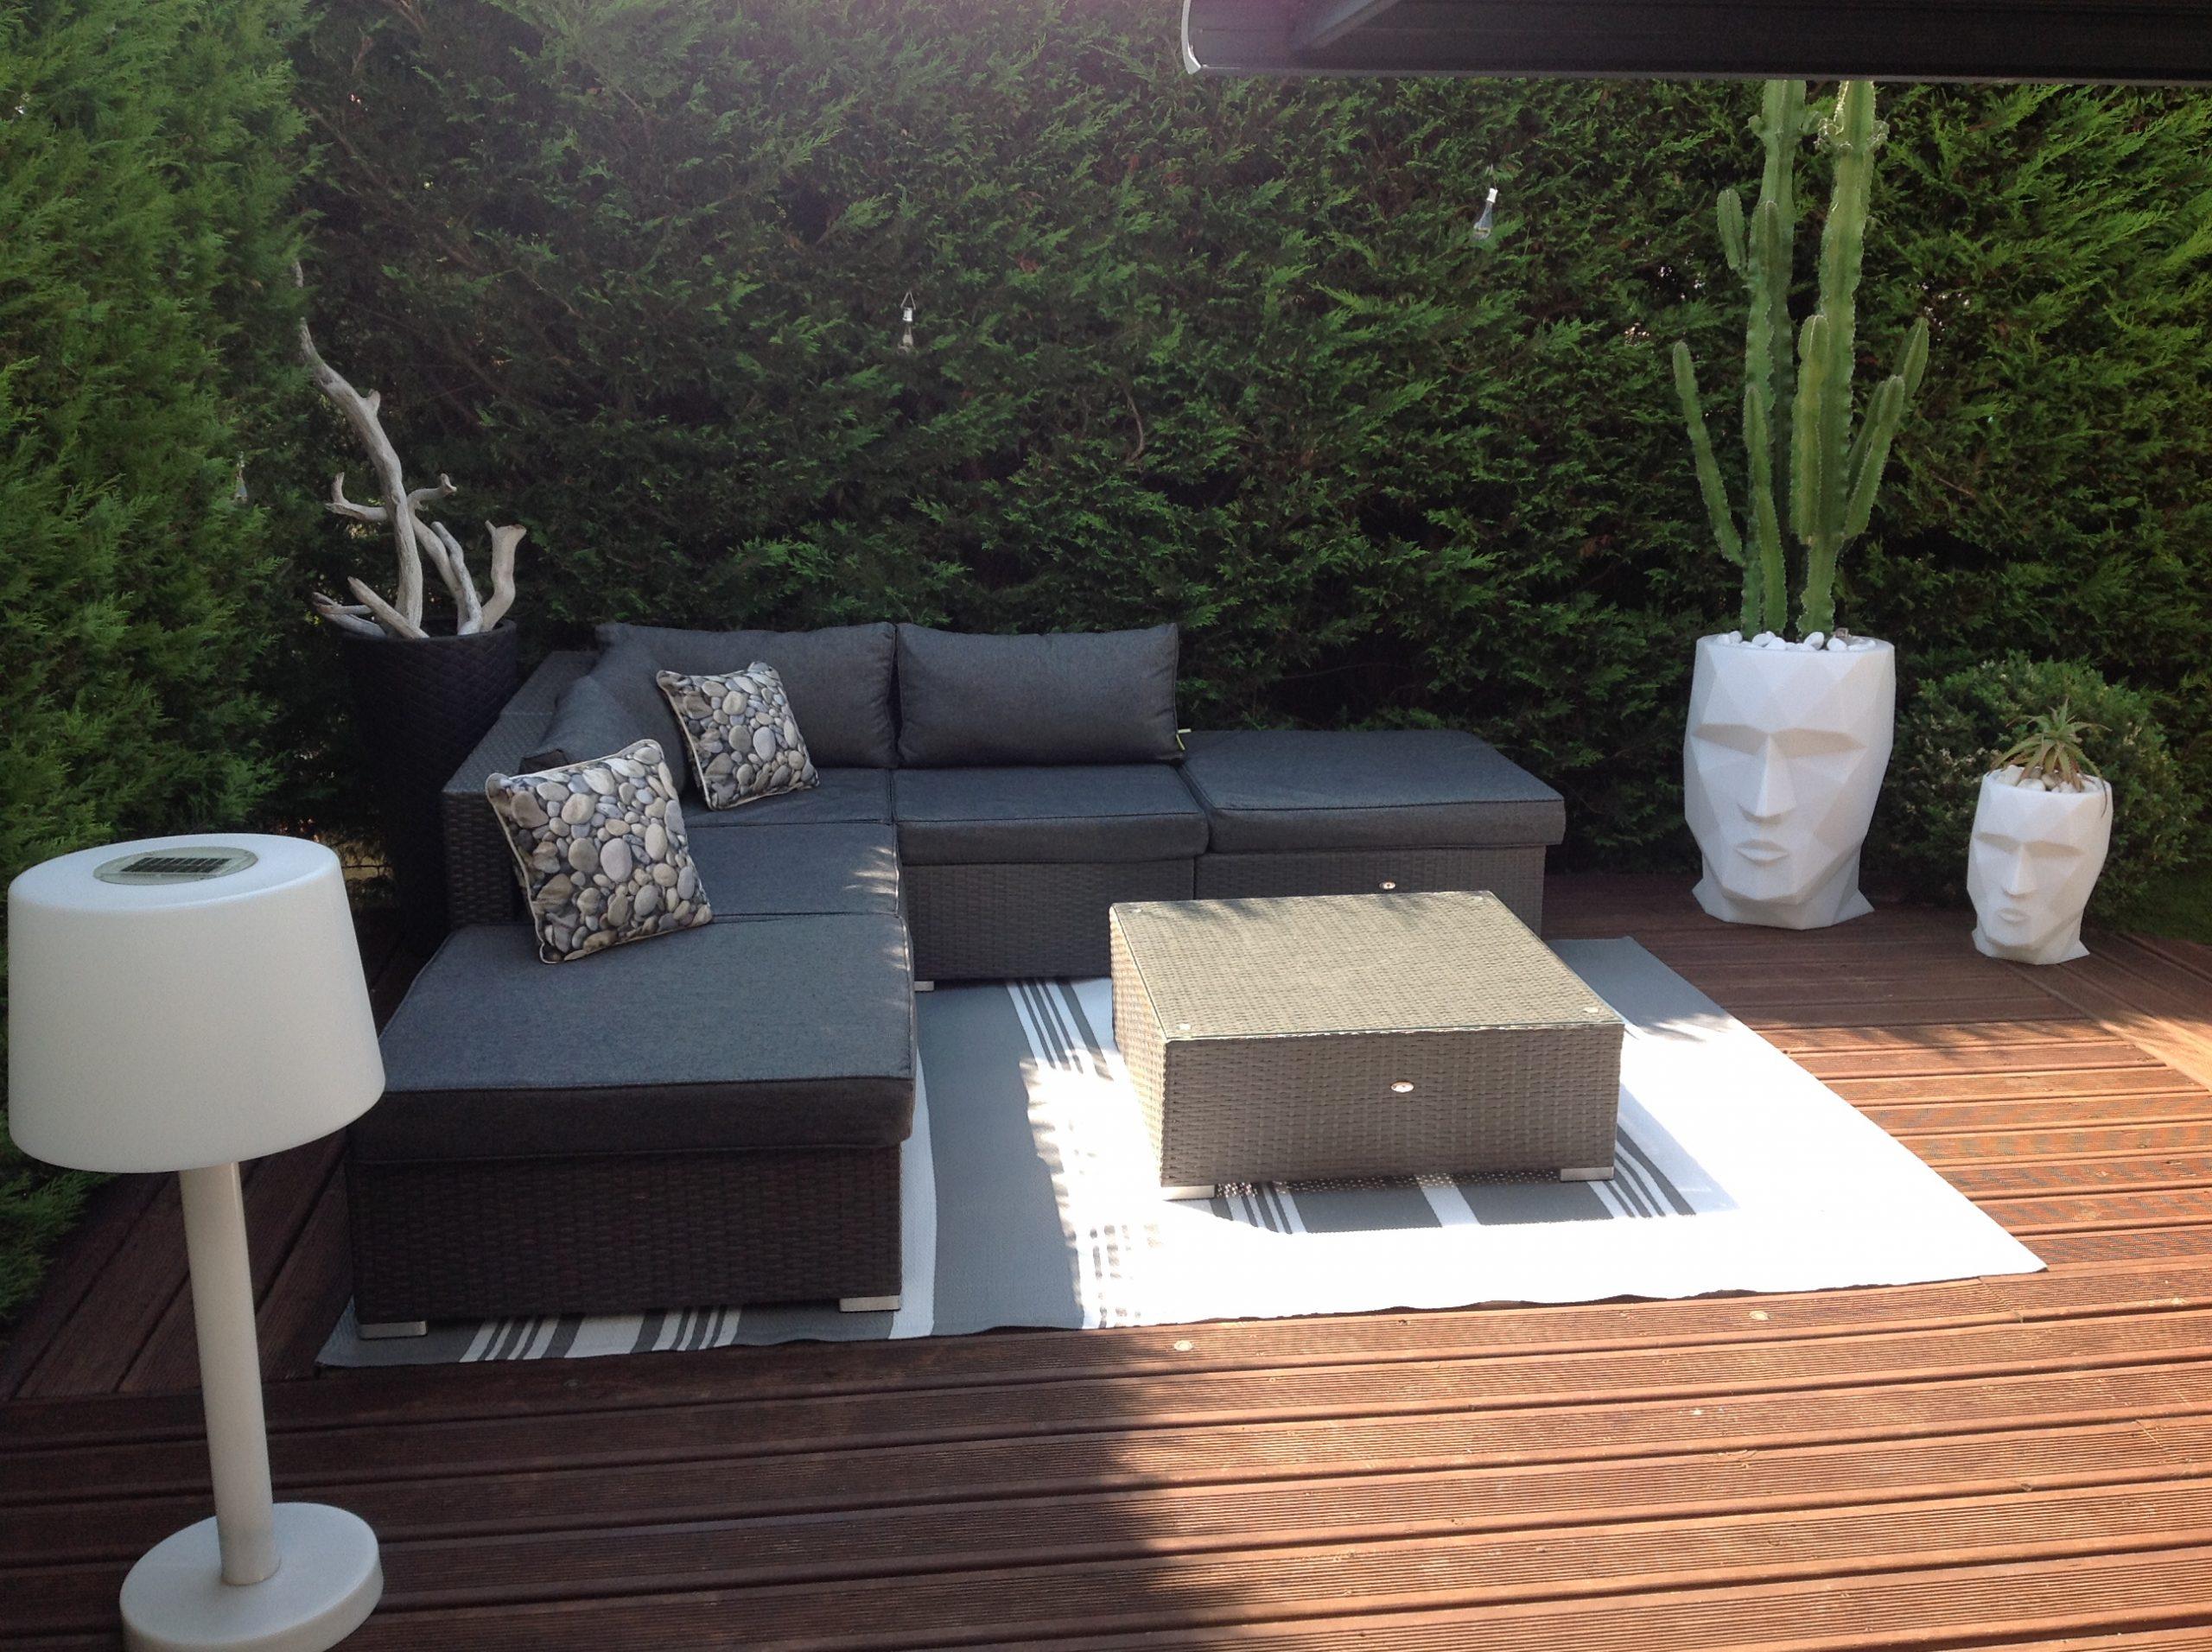 Salon De Jardin Exterieur Design - Yaser.vtngcf.org dedans Salon De Détente Jardin